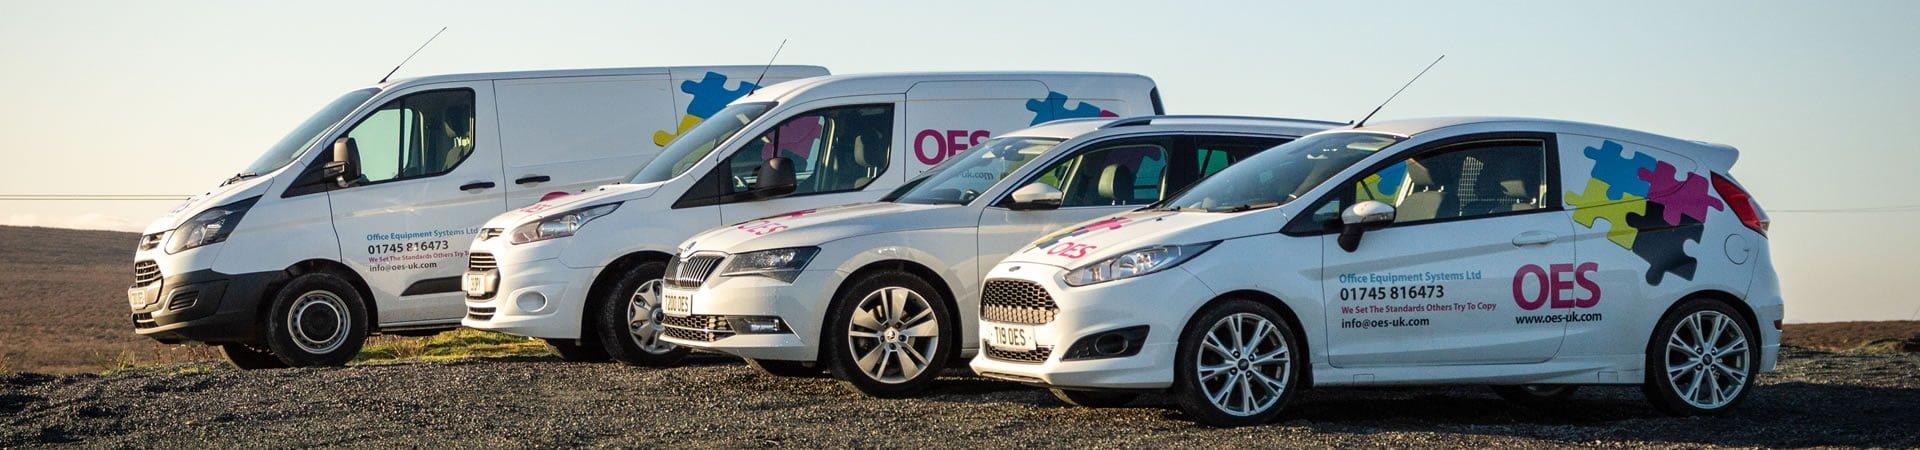 OES fleet parked on the Denbigh Moors